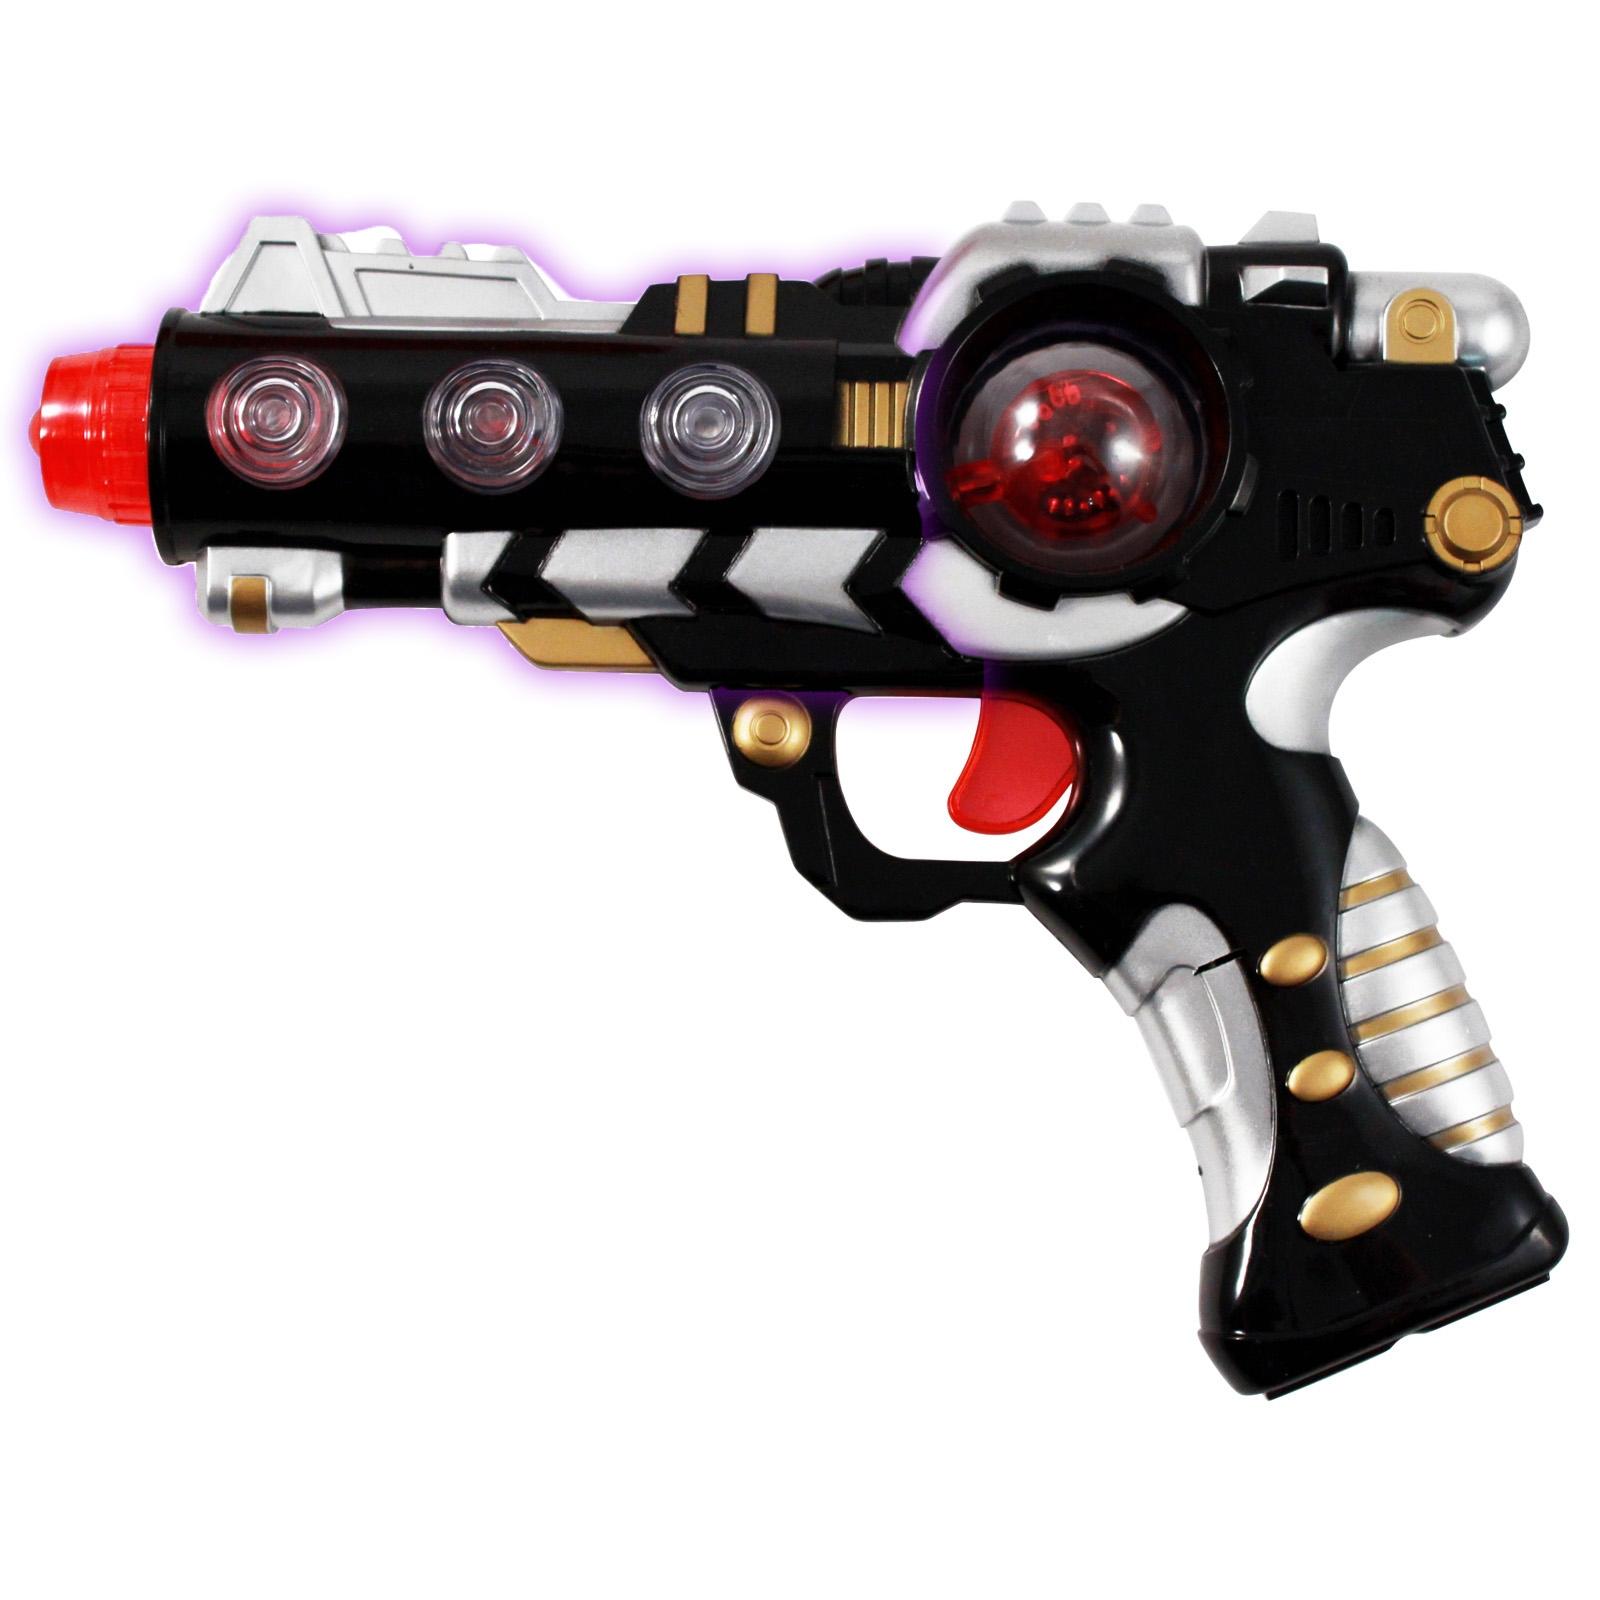 Intergalactic Superhero Laser Space Gun with Alternating LED Lights Sound - Black